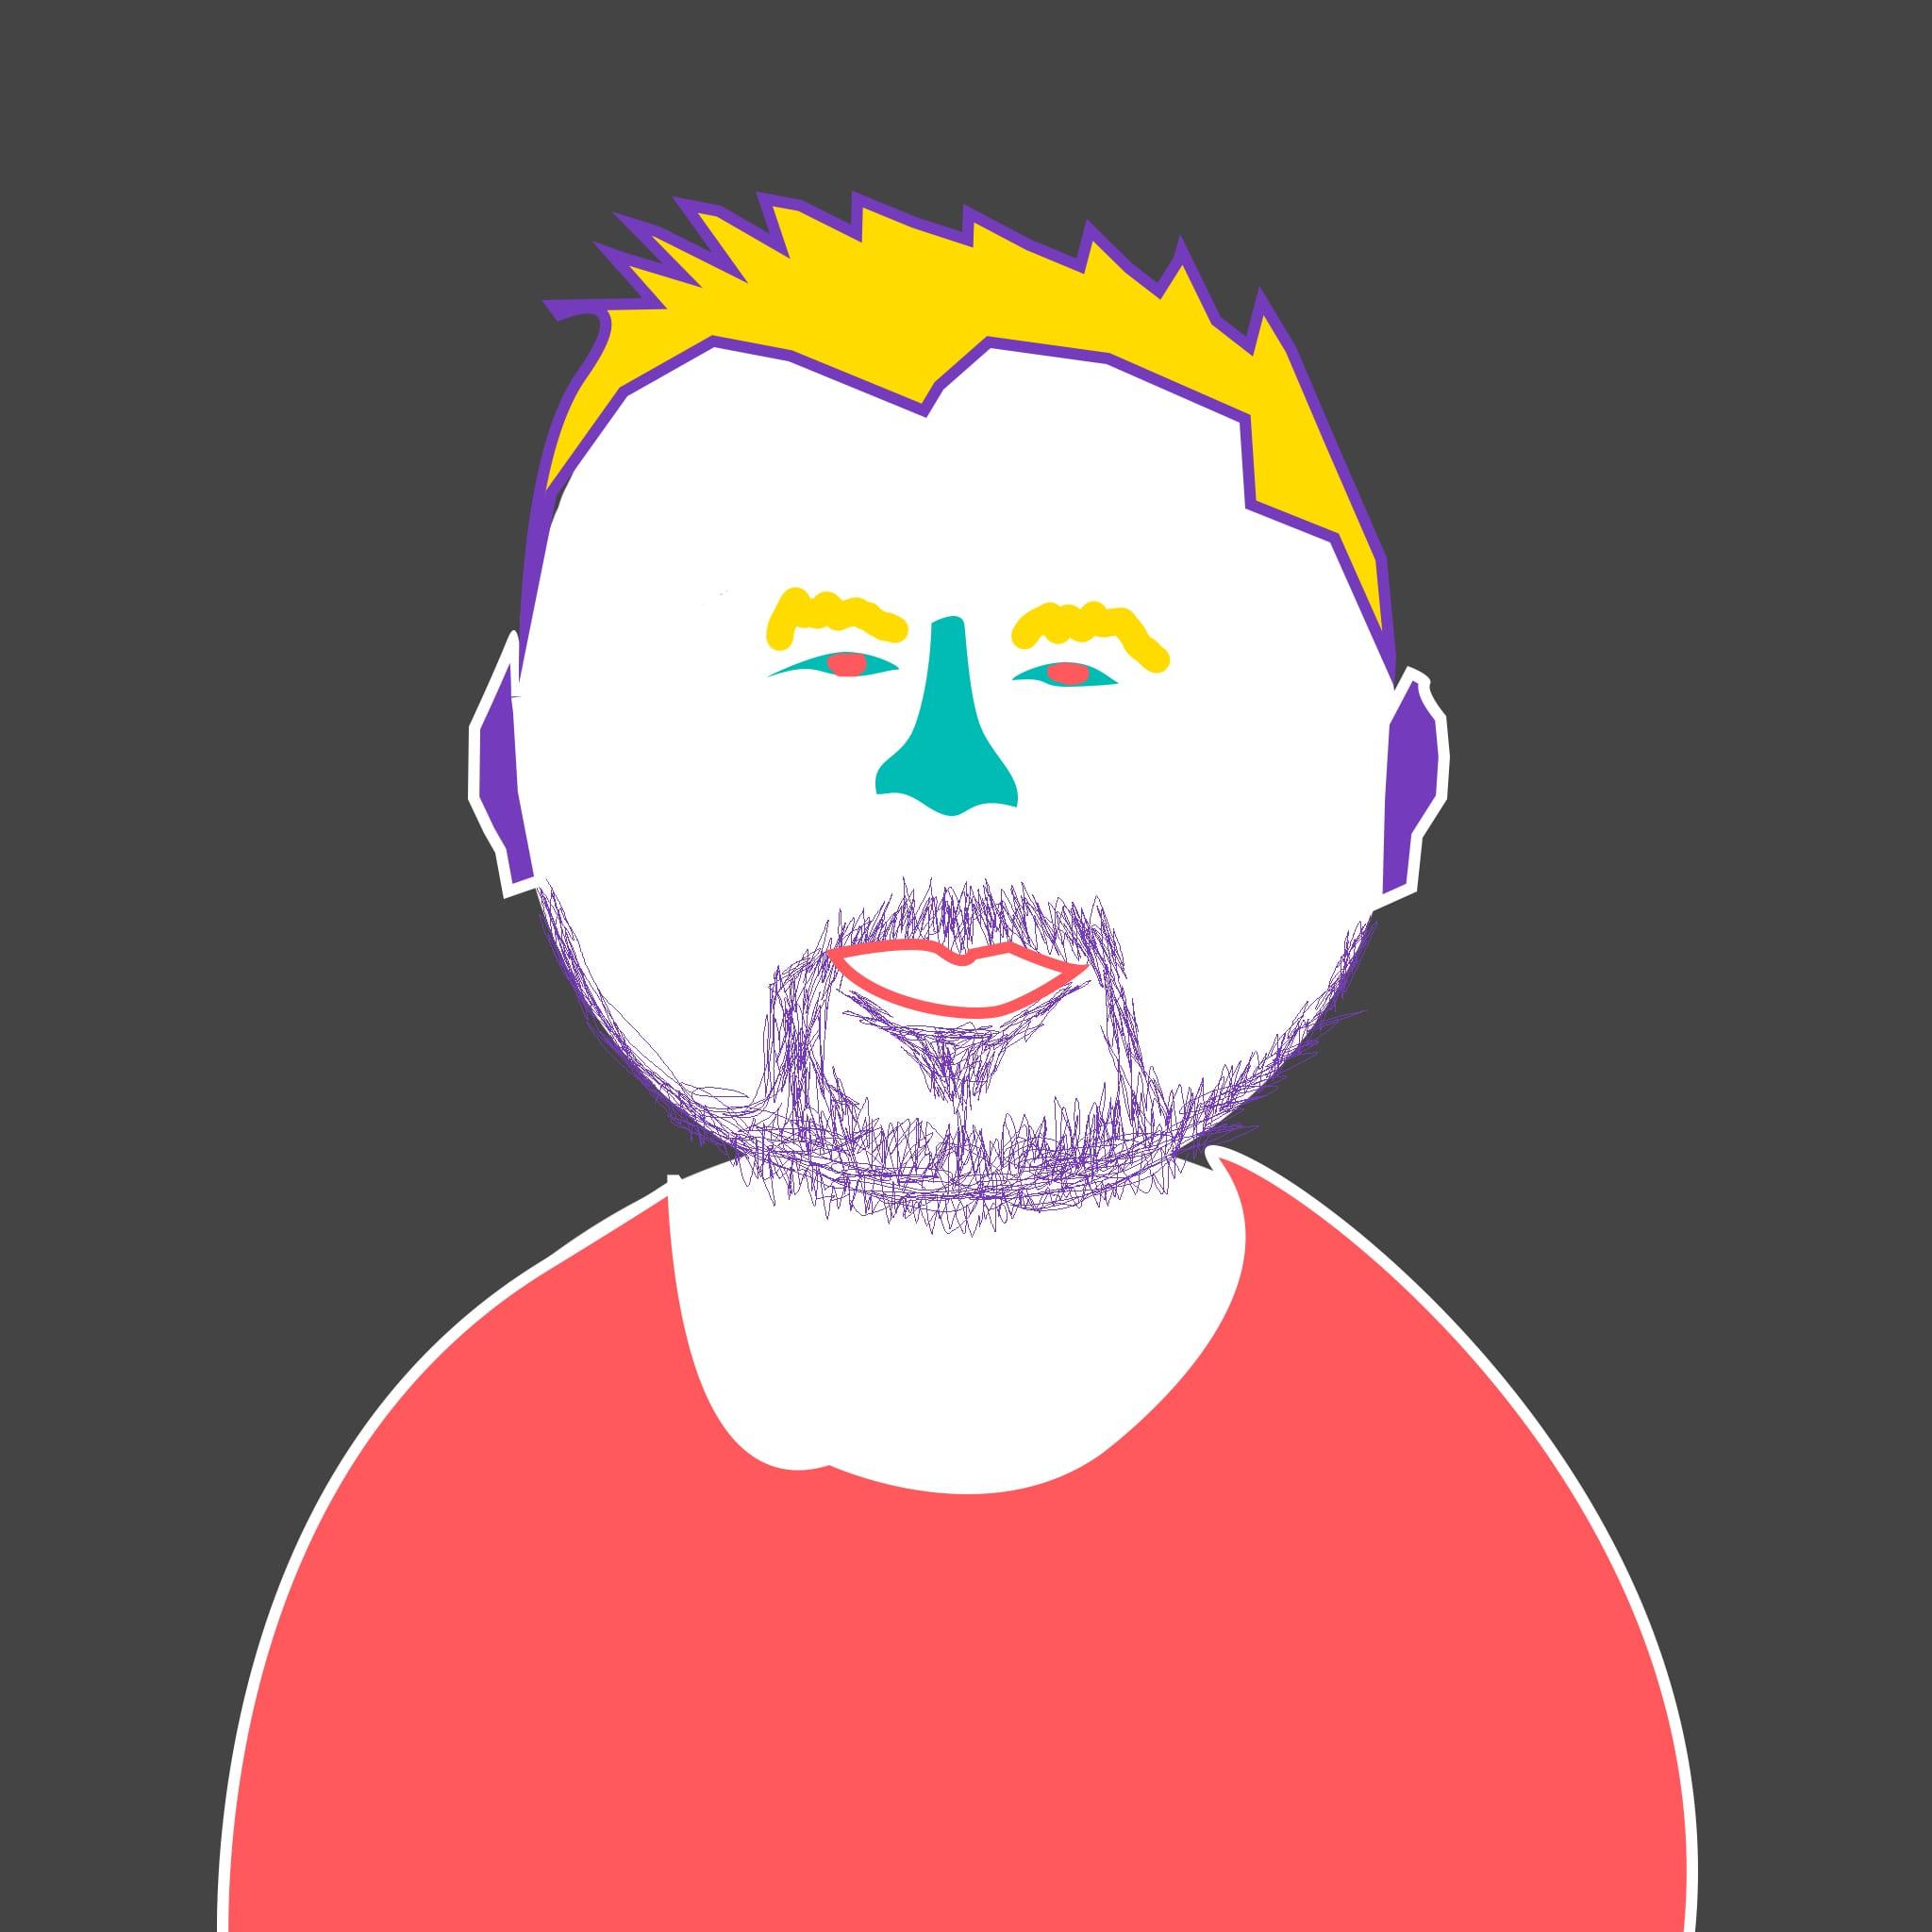 Krupei drawn headshot